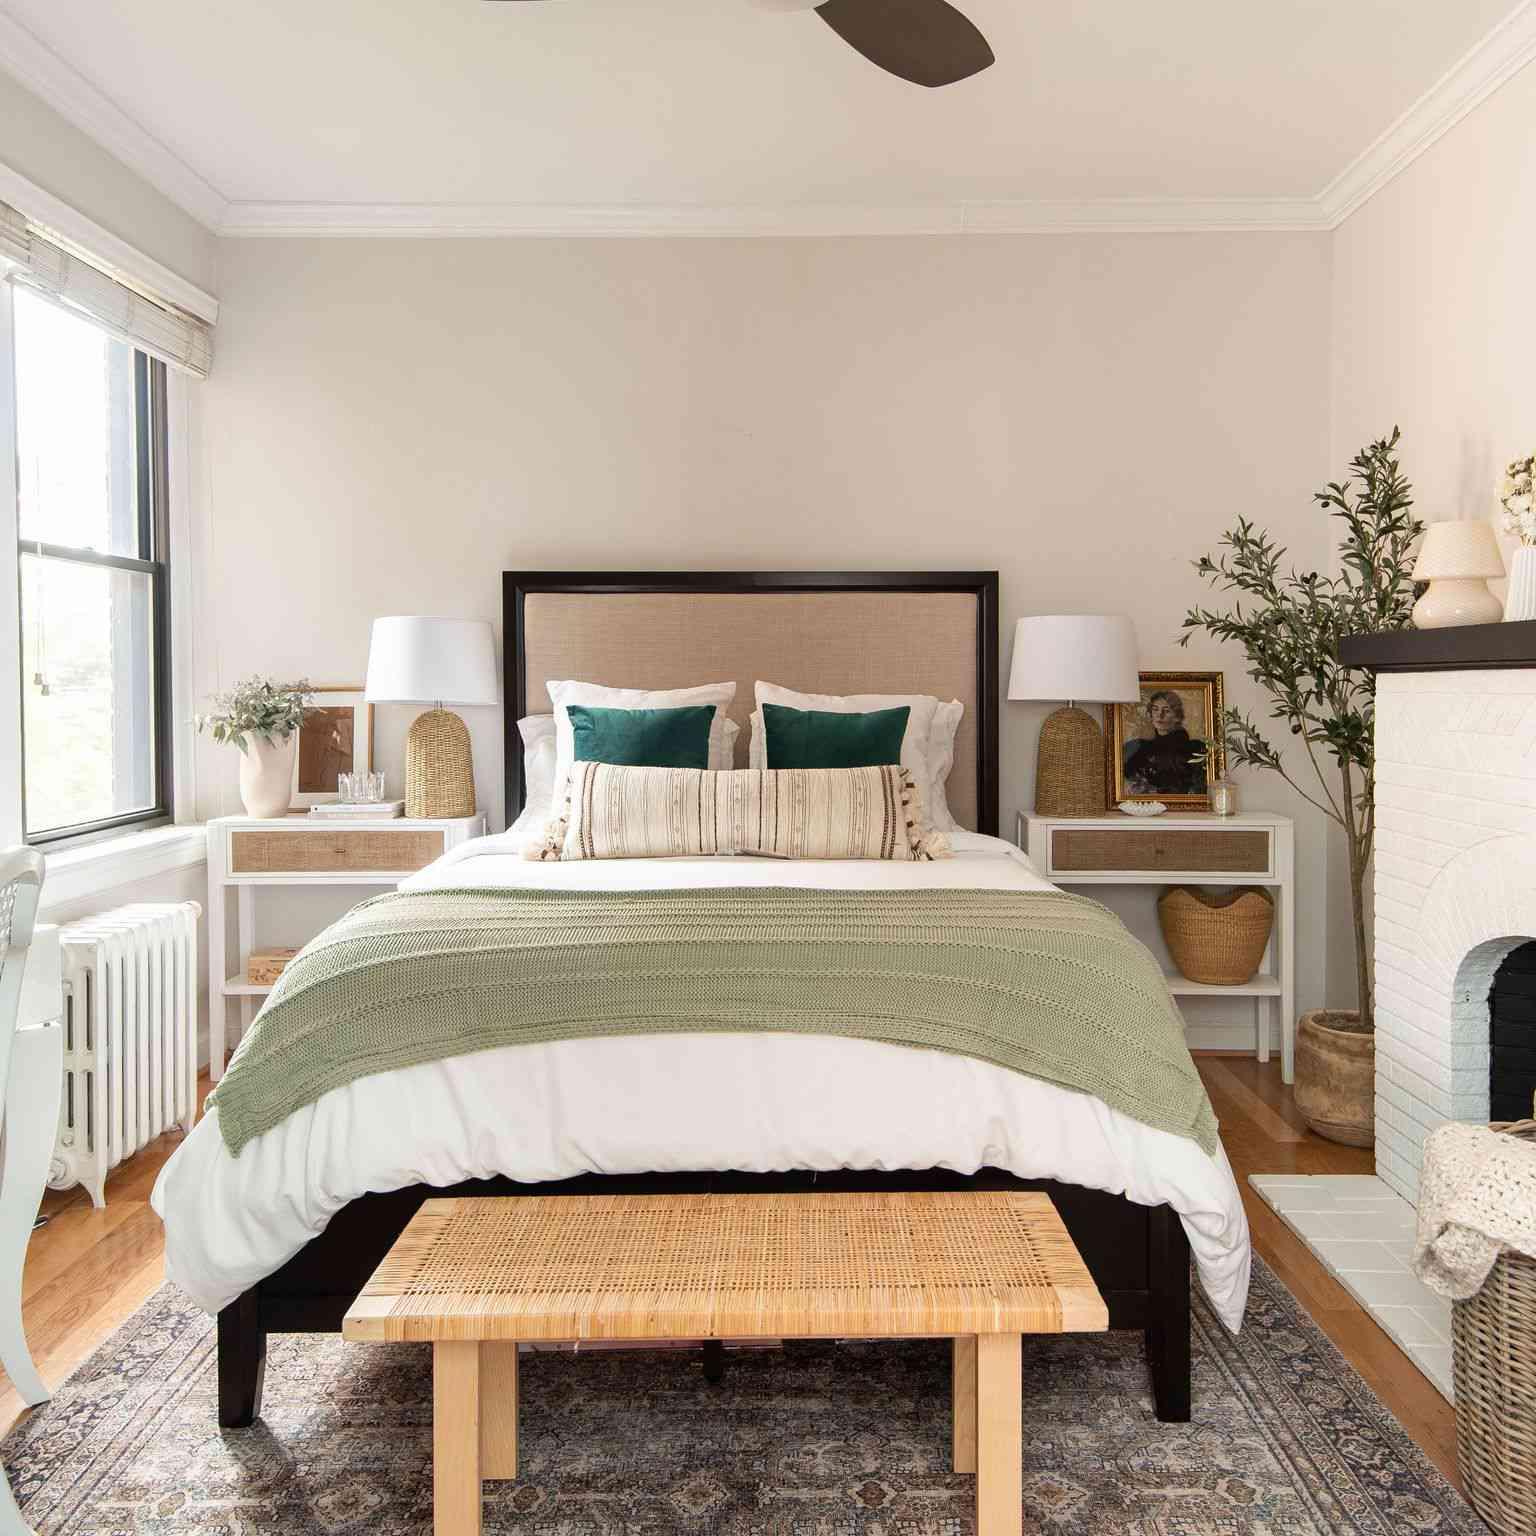 Bedroom with vintage rug.